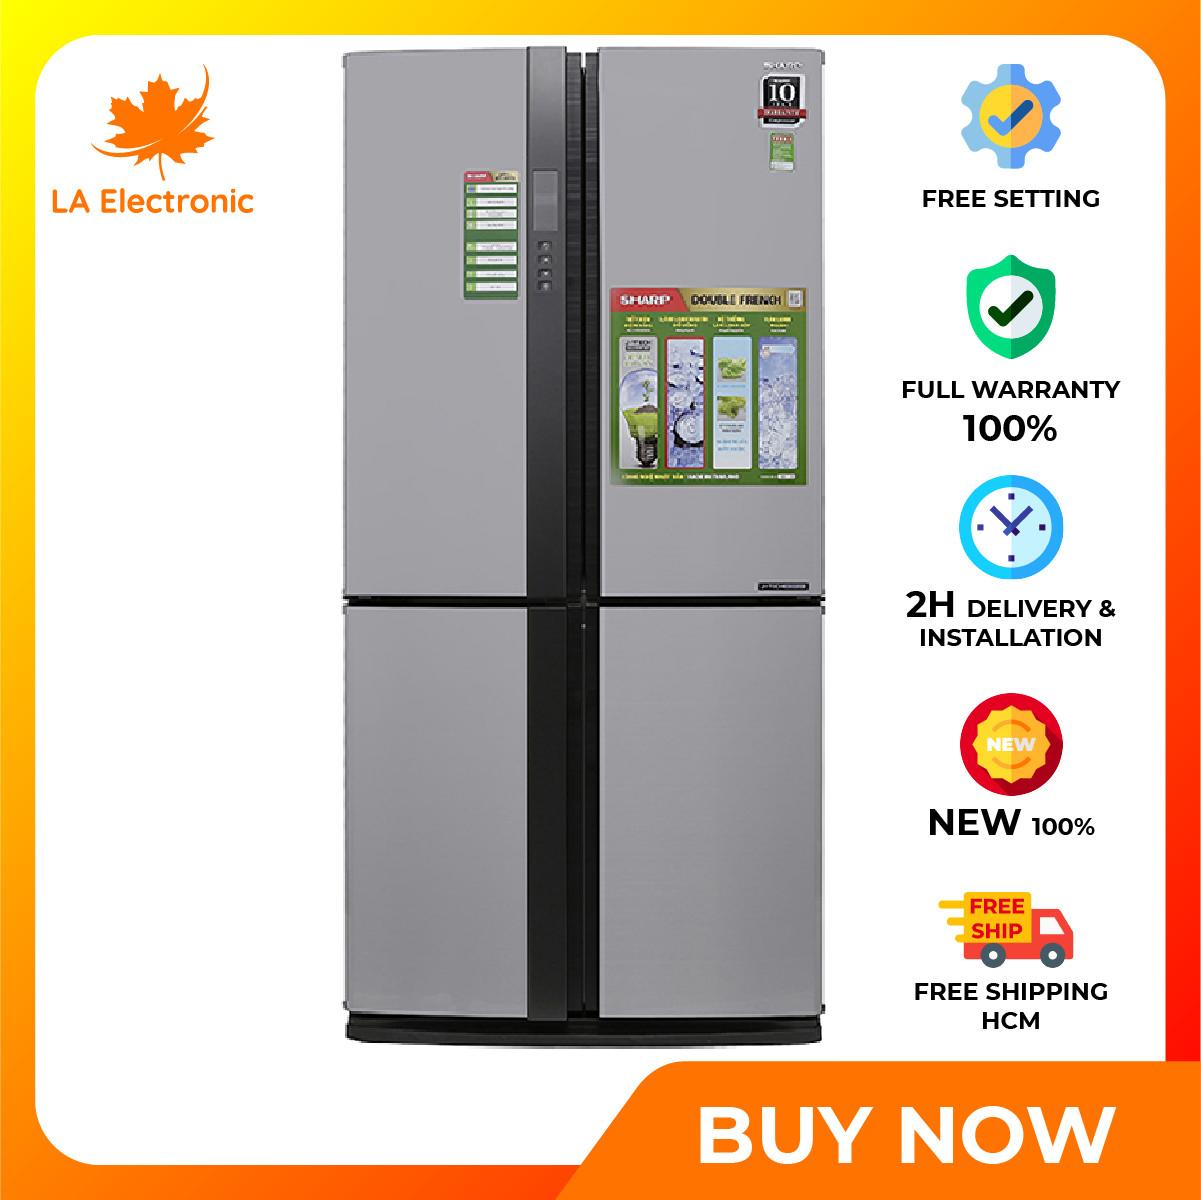 Trả Góp 0% – Tủ Lạnh – Sharp Inverter 626 liter refrigerator SJ-FX631V-SL Full VAT – Miễn phí vận chuyển HCM